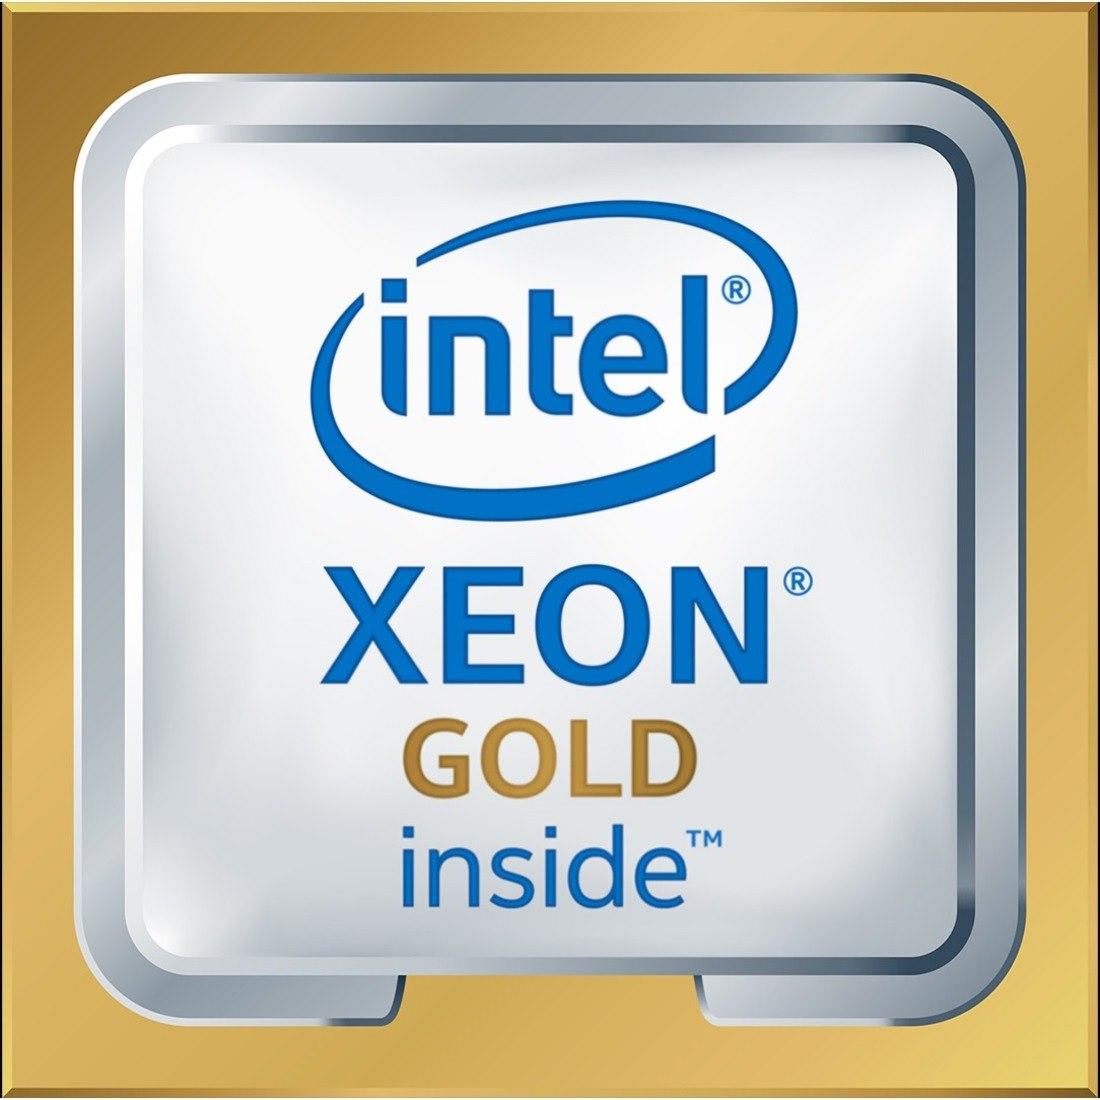 Cisco Intel Xeon 6128 Hexa-core (6 Core) 3.40 GHz Processor Upgrade